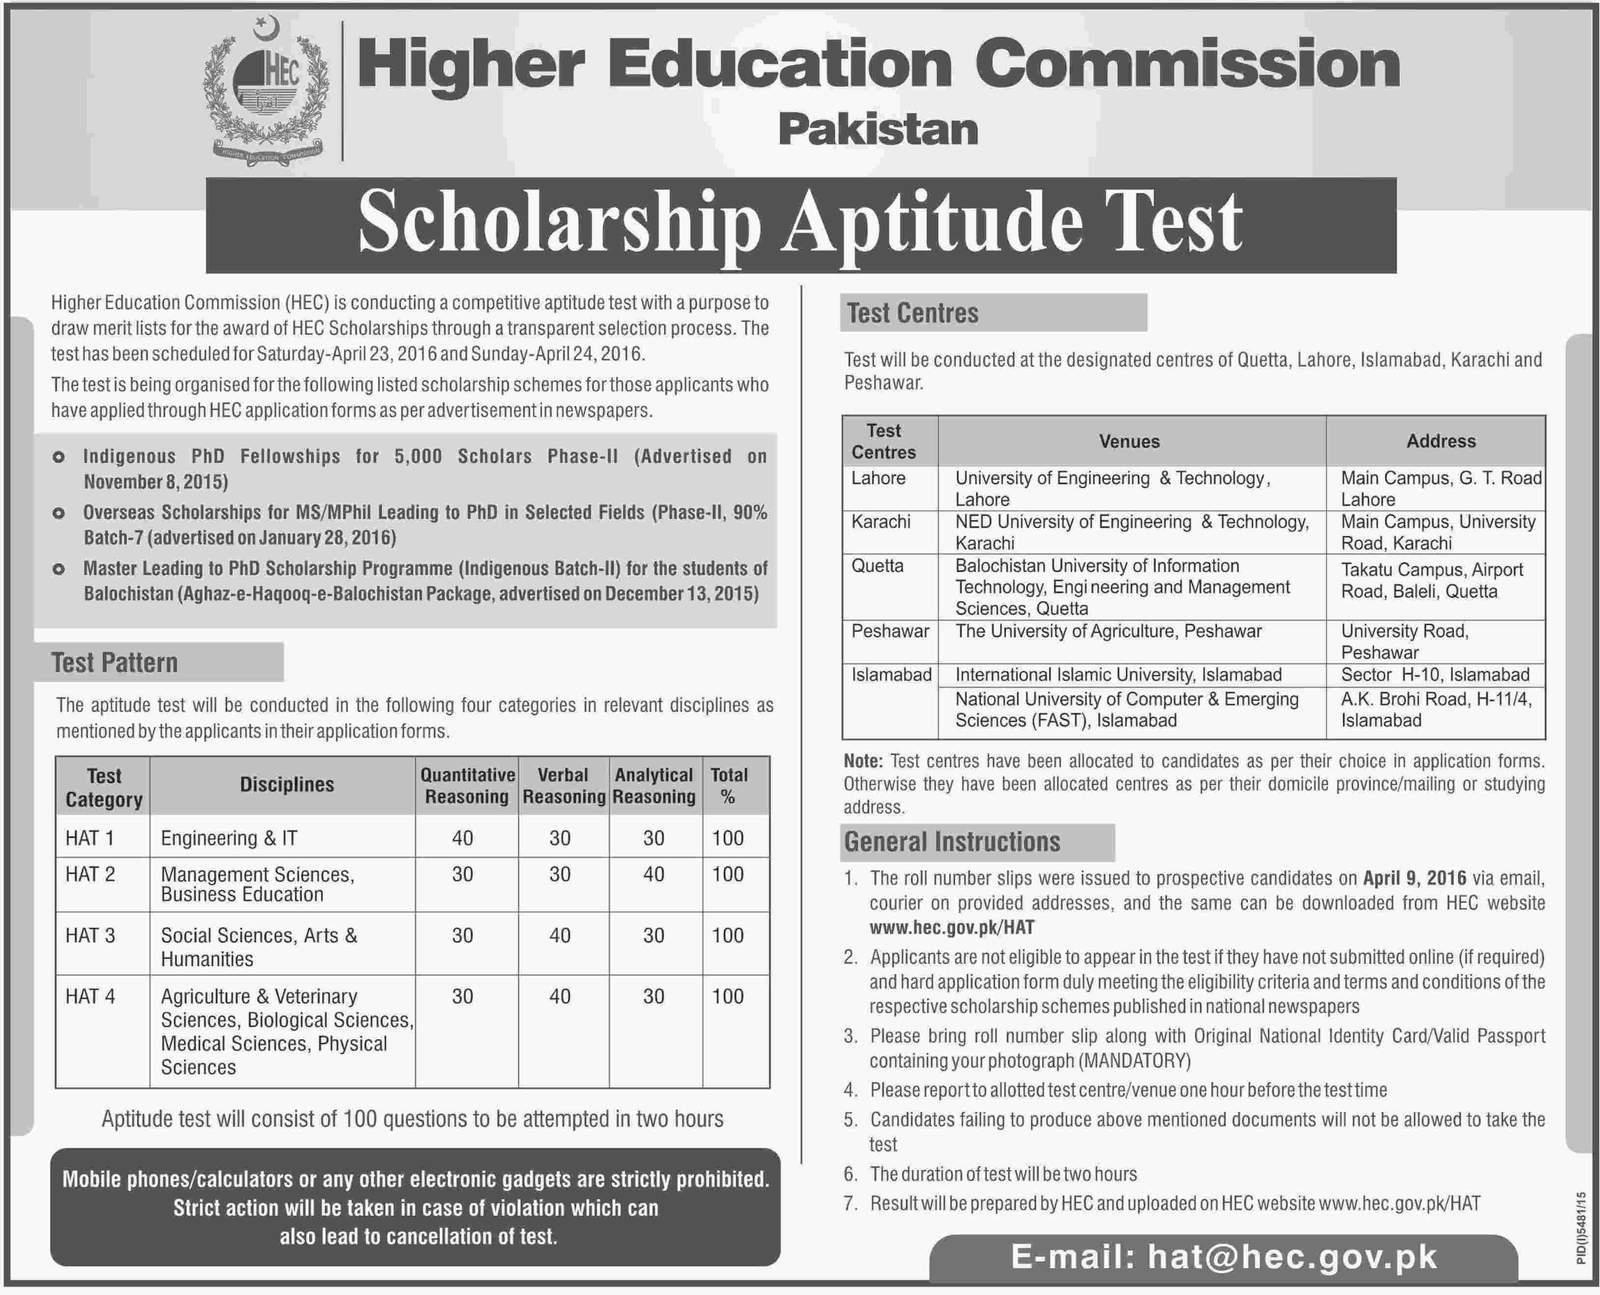 HEC Scholarship Aptitude Test 2016, Test Category, HAT-1 HAT